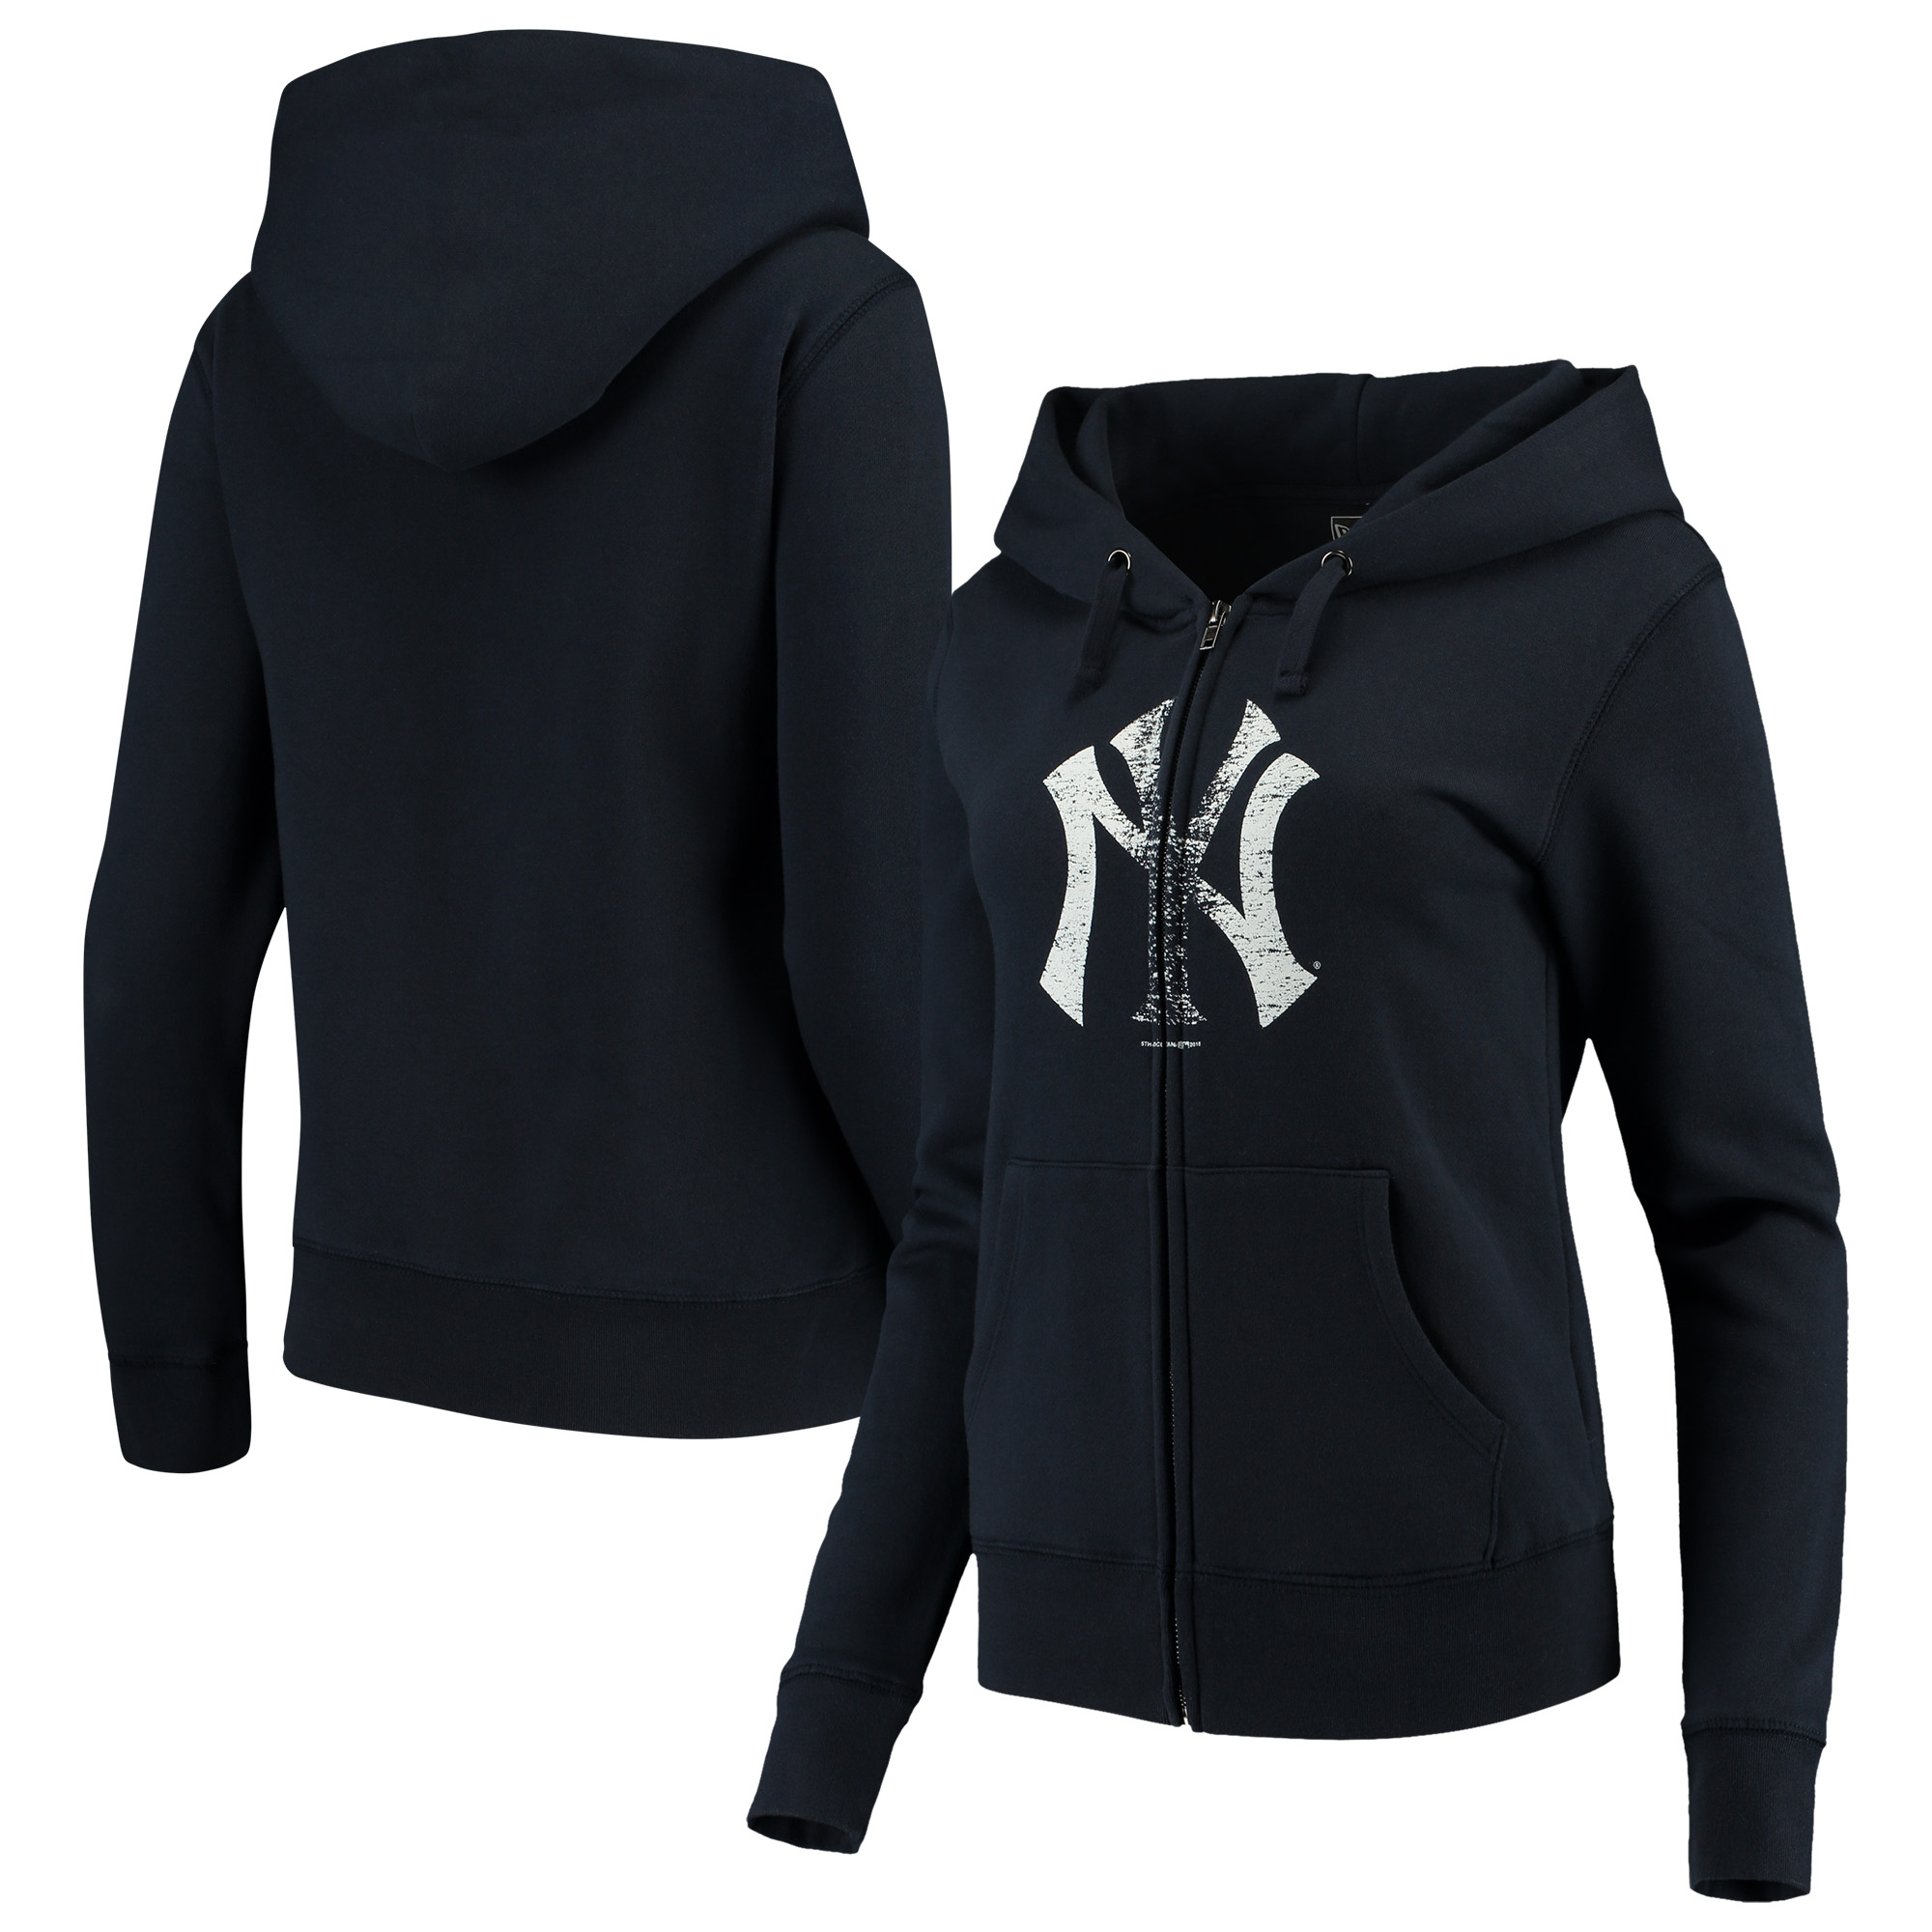 New York Yankees 5th & Ocean by New Era Women's Core Fleece Hoodie - Navy Blue